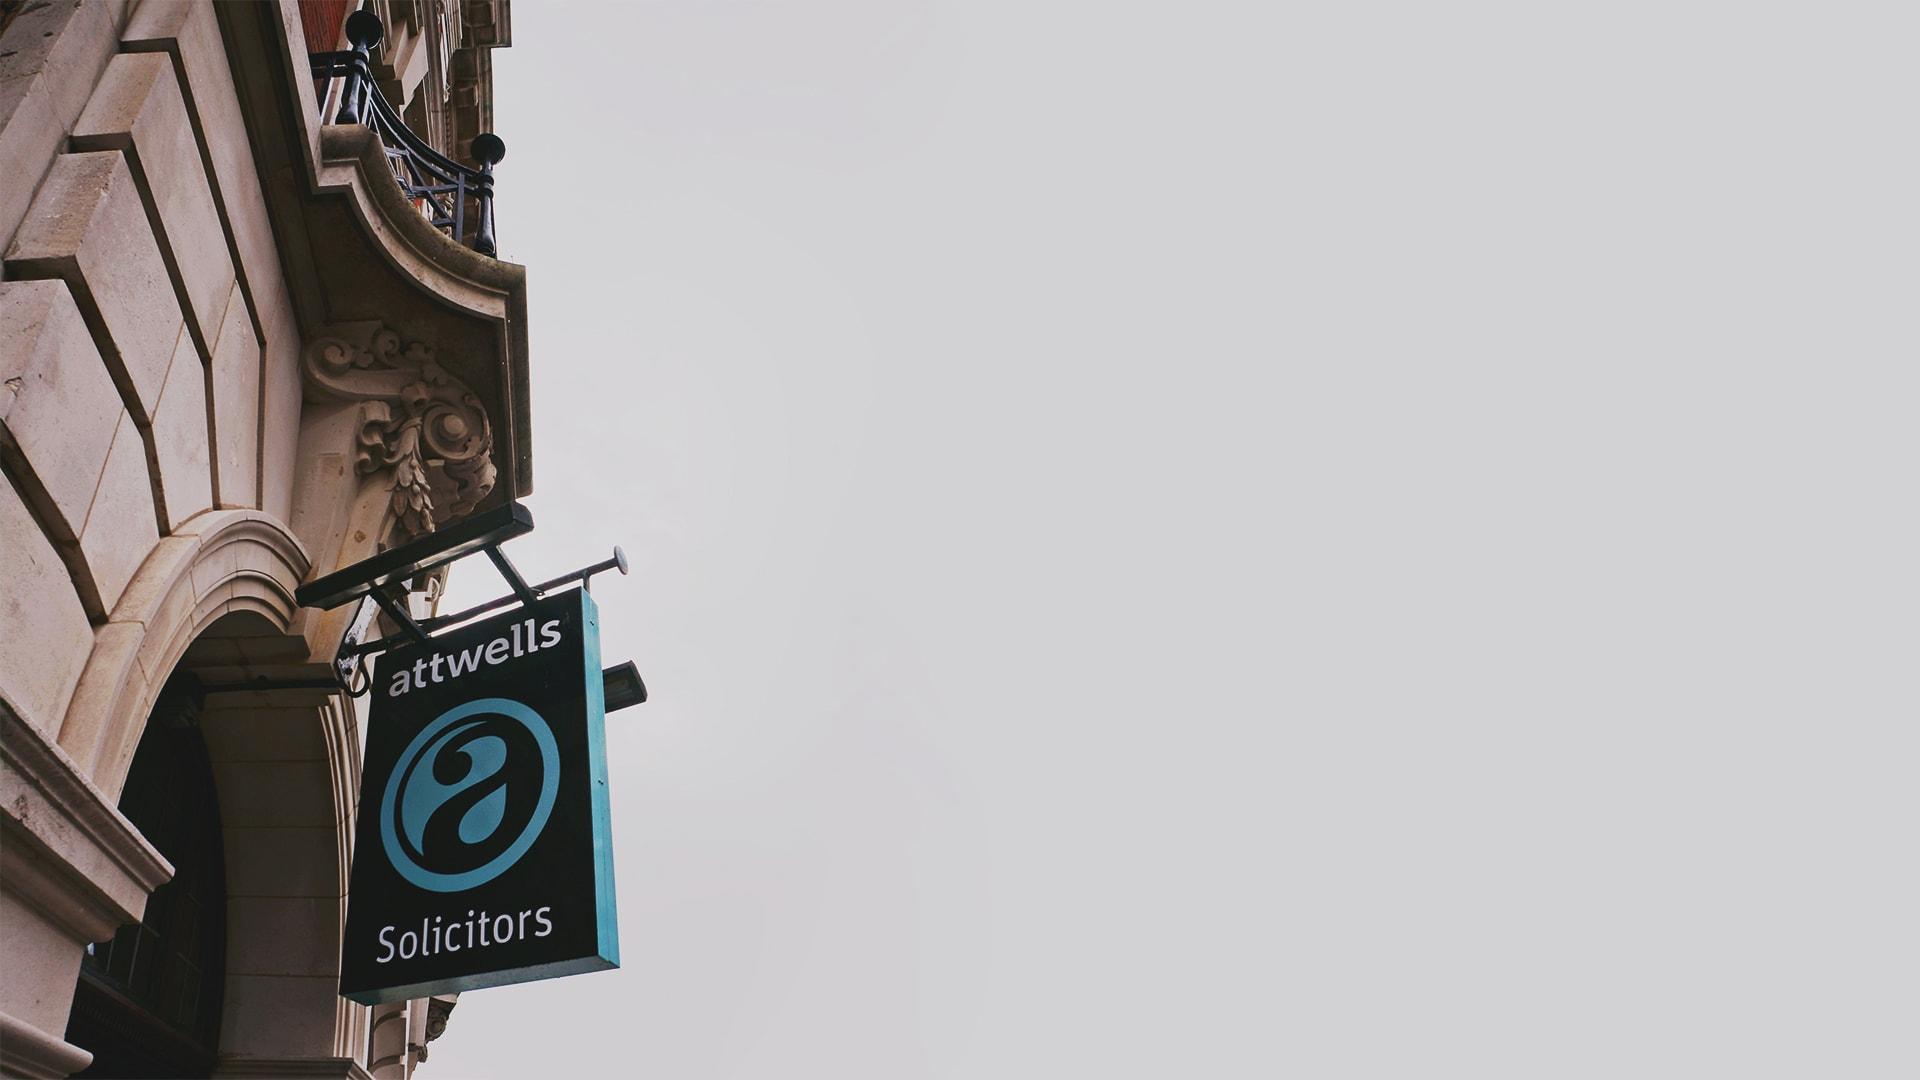 attwells signage